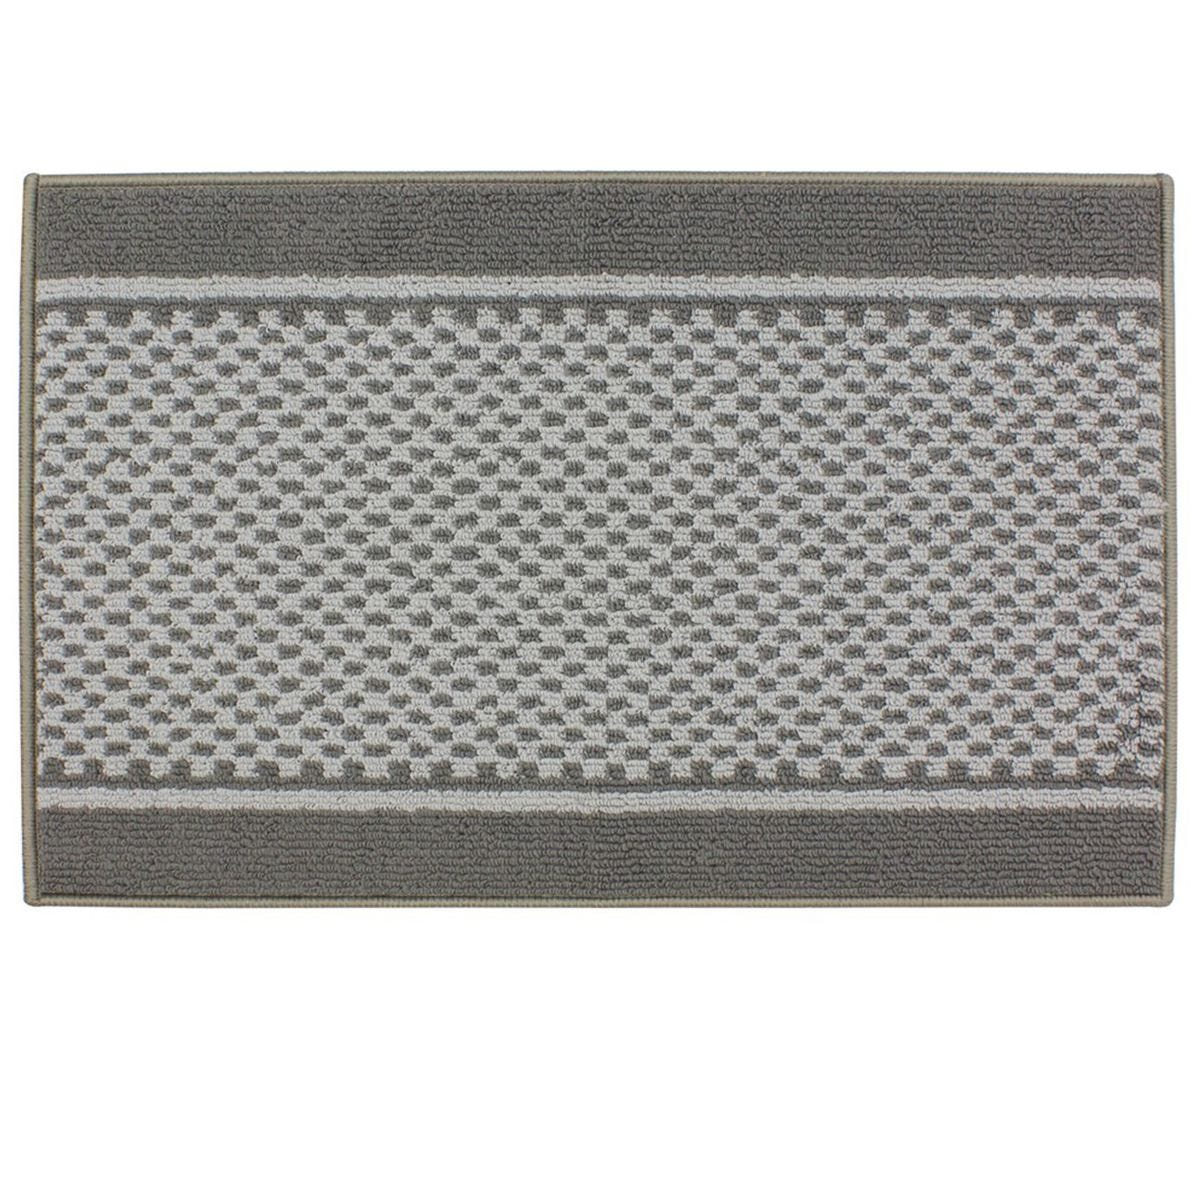 JVL 57x90cm Bologna Machine Washable Door Mat - Dark/Light Grey